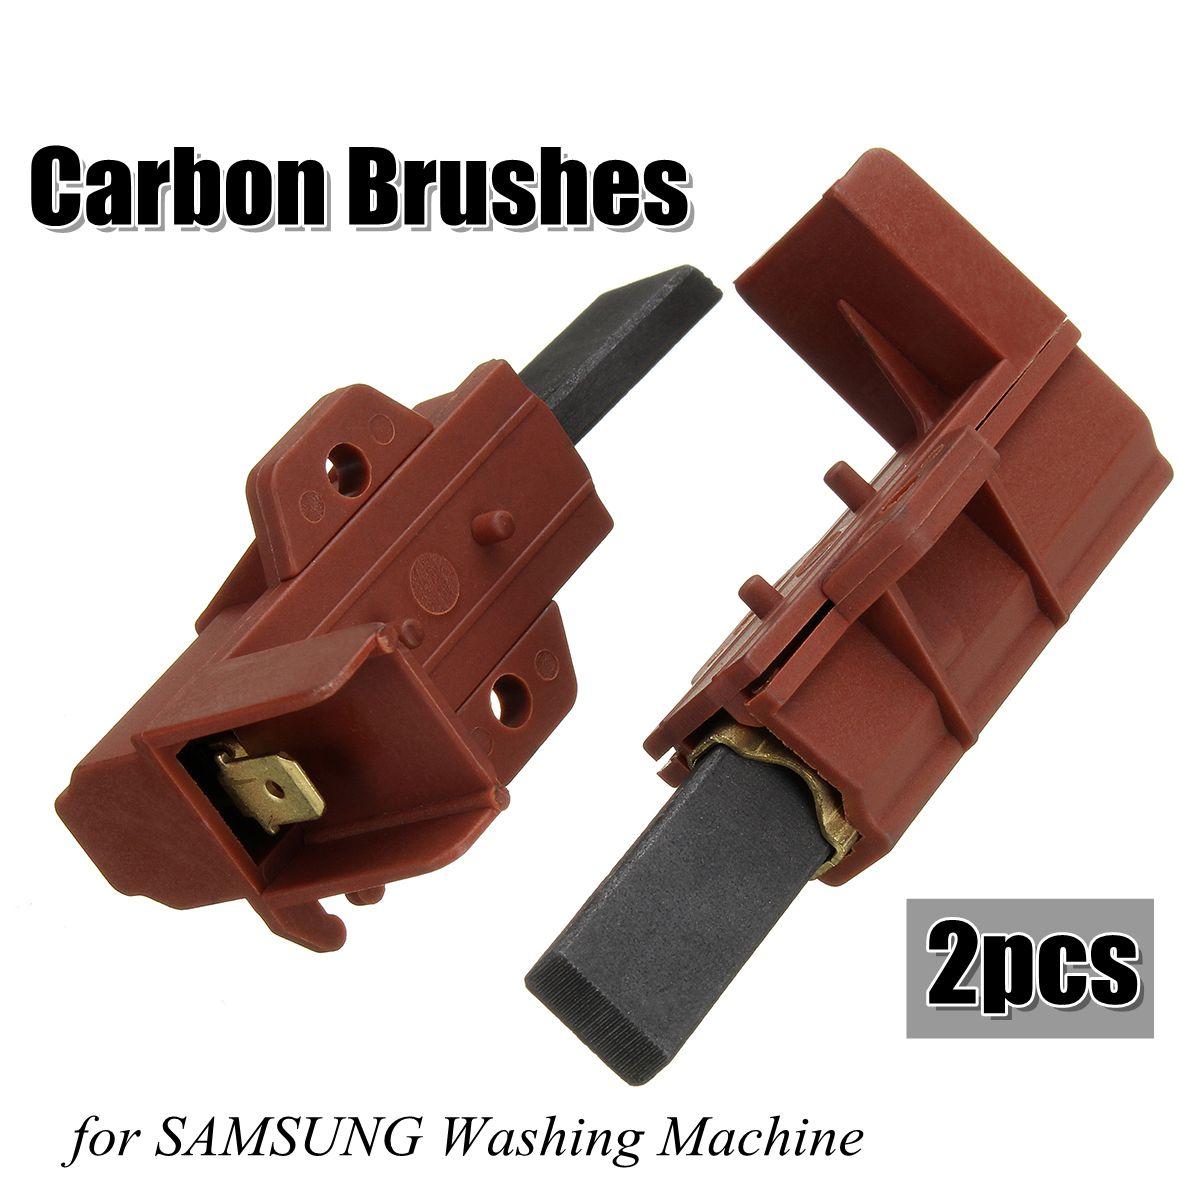 Pack of 2 Indesit IWB6113ECOUK Washing Machine Carbon Brush for Indesco Motors